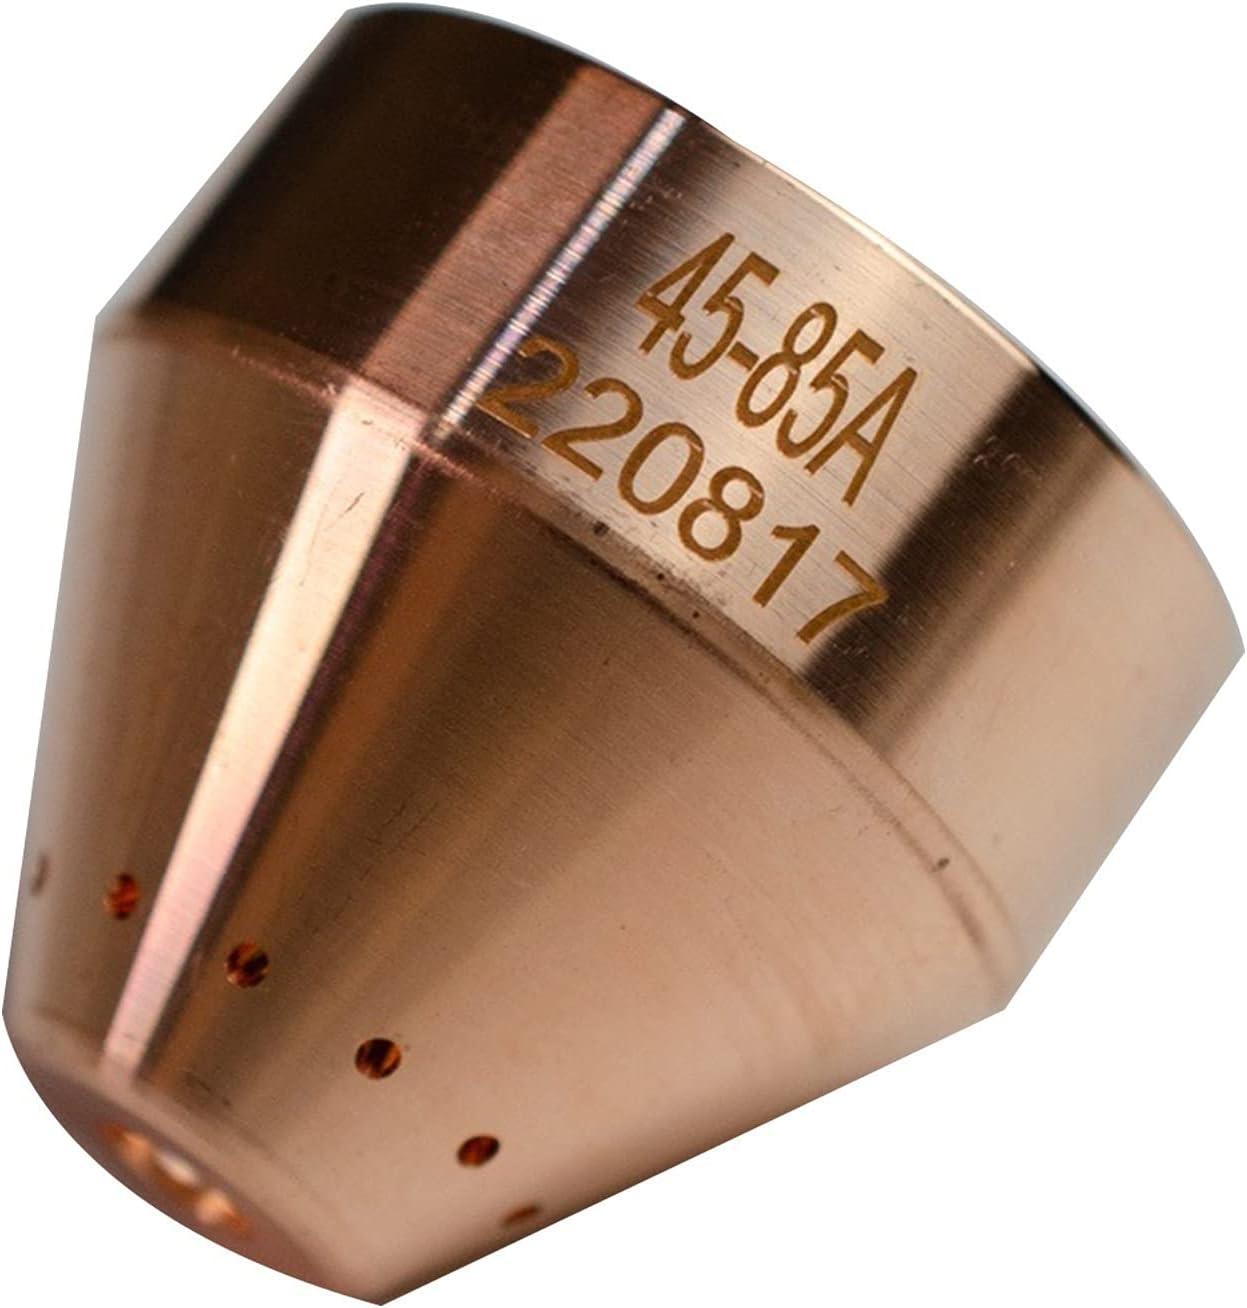 Welding Heat Gun Nozzle Super special price Hot Stainl Japan Maker New Air